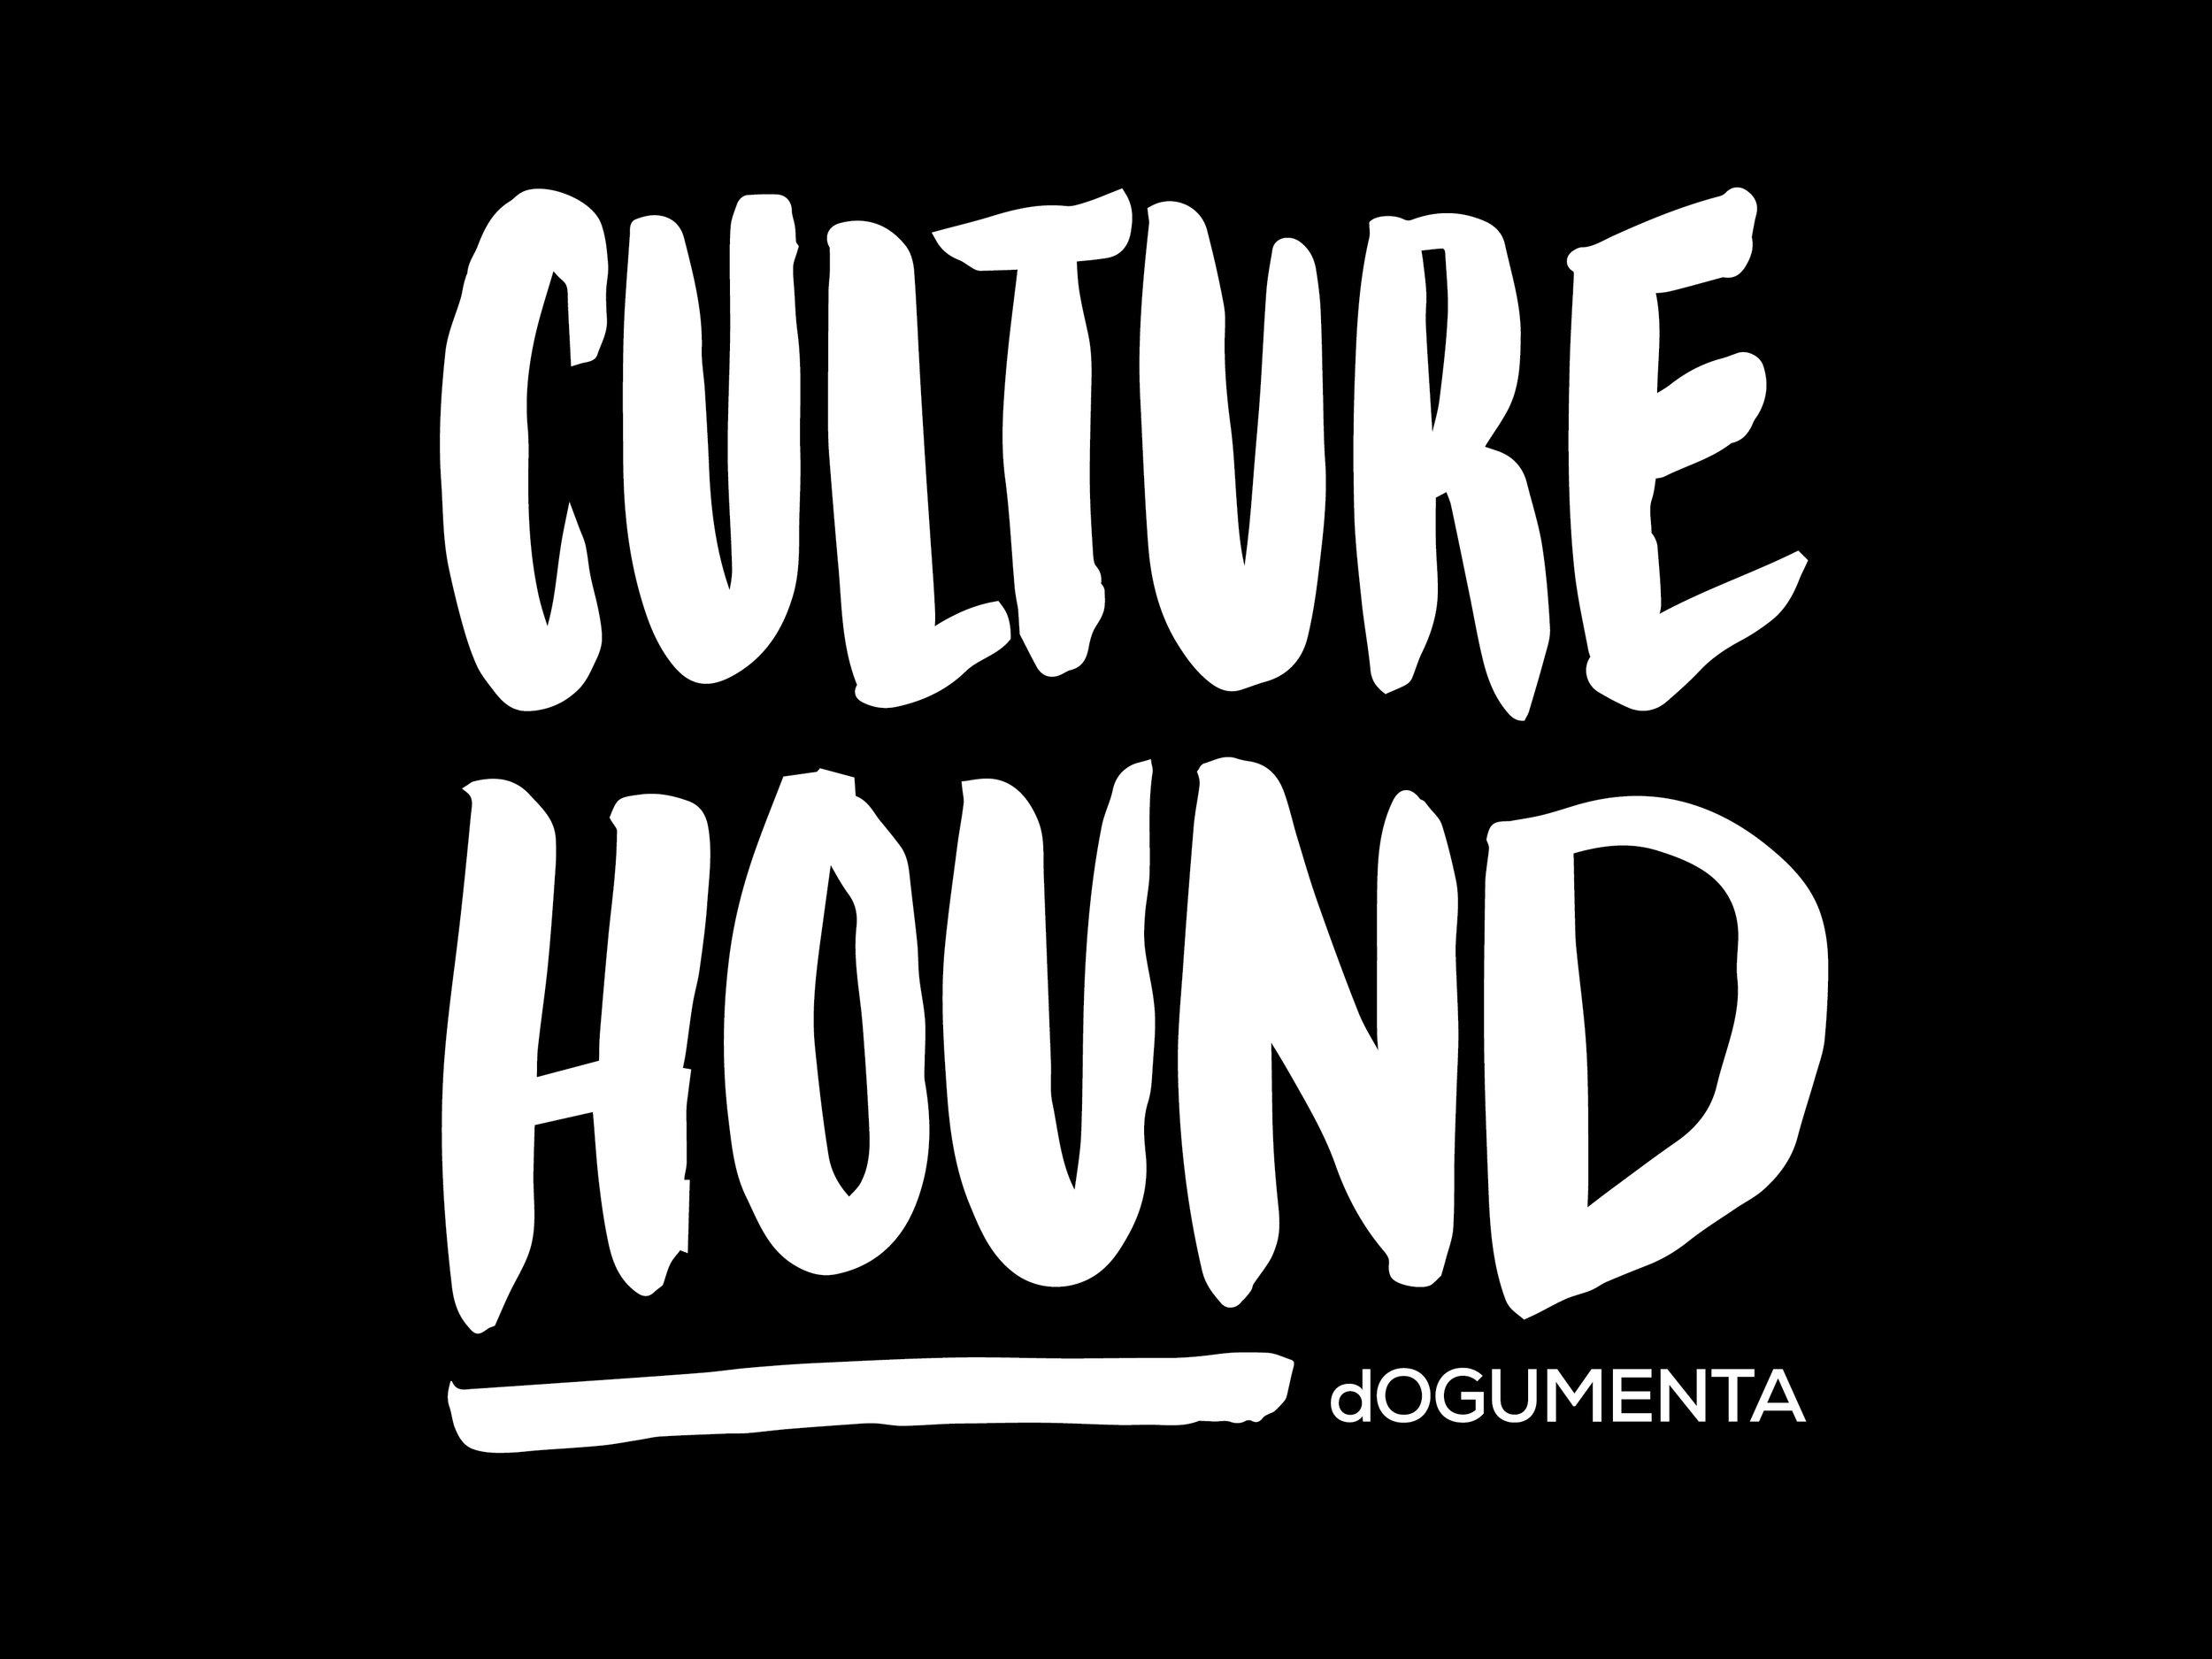 Culture Hound FINAL-01.jpg